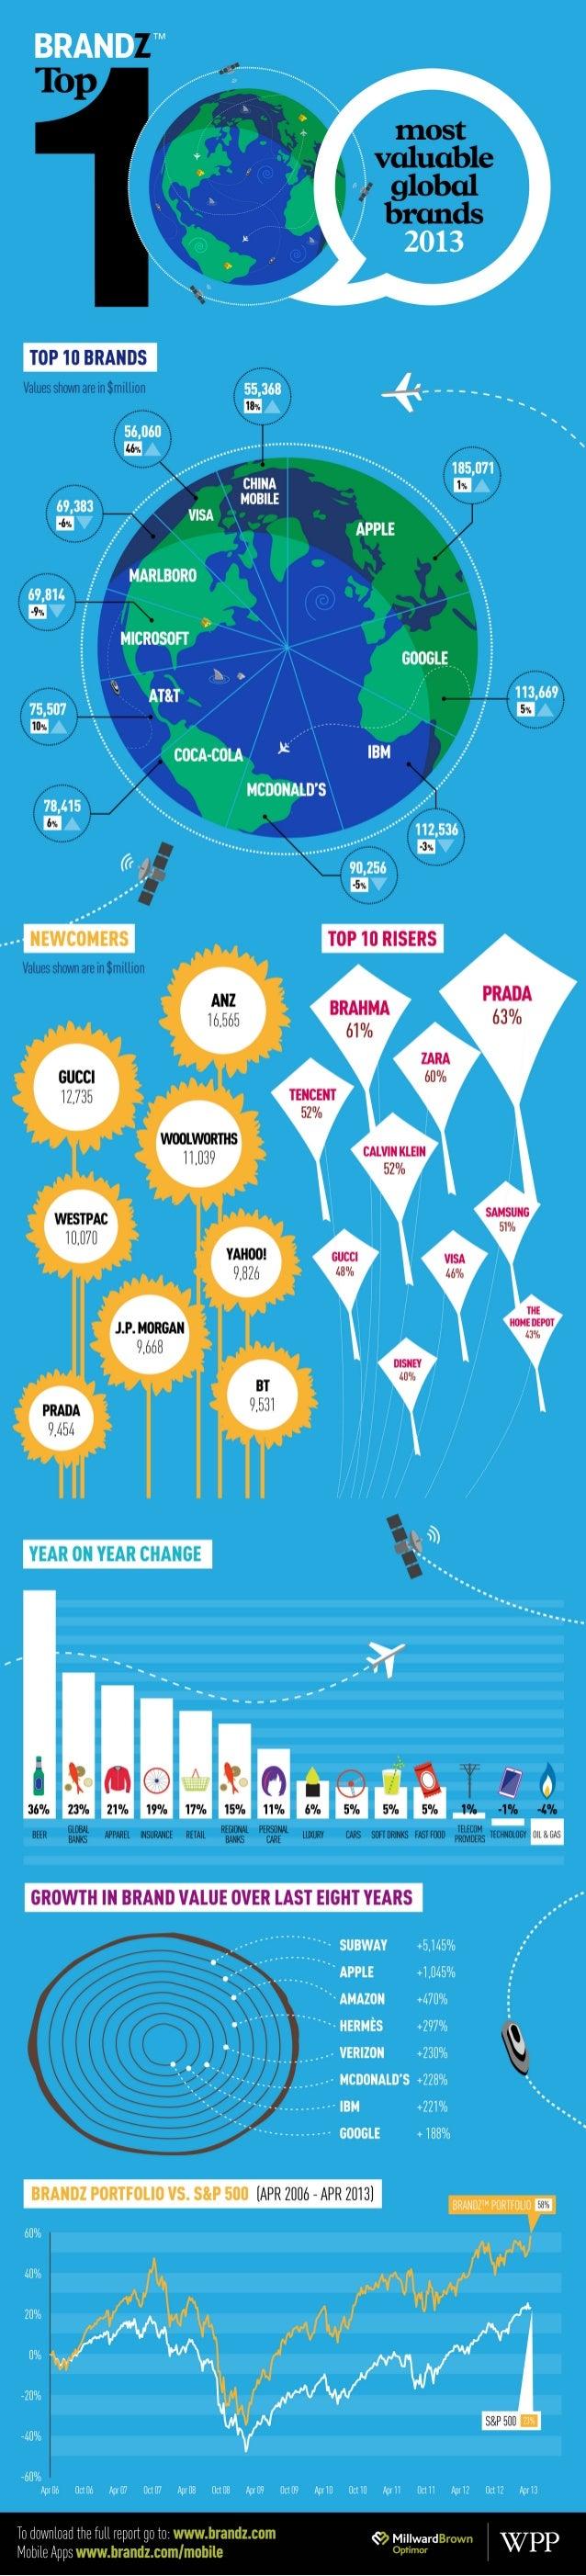 2013 BrandZ Top 100 Infographic